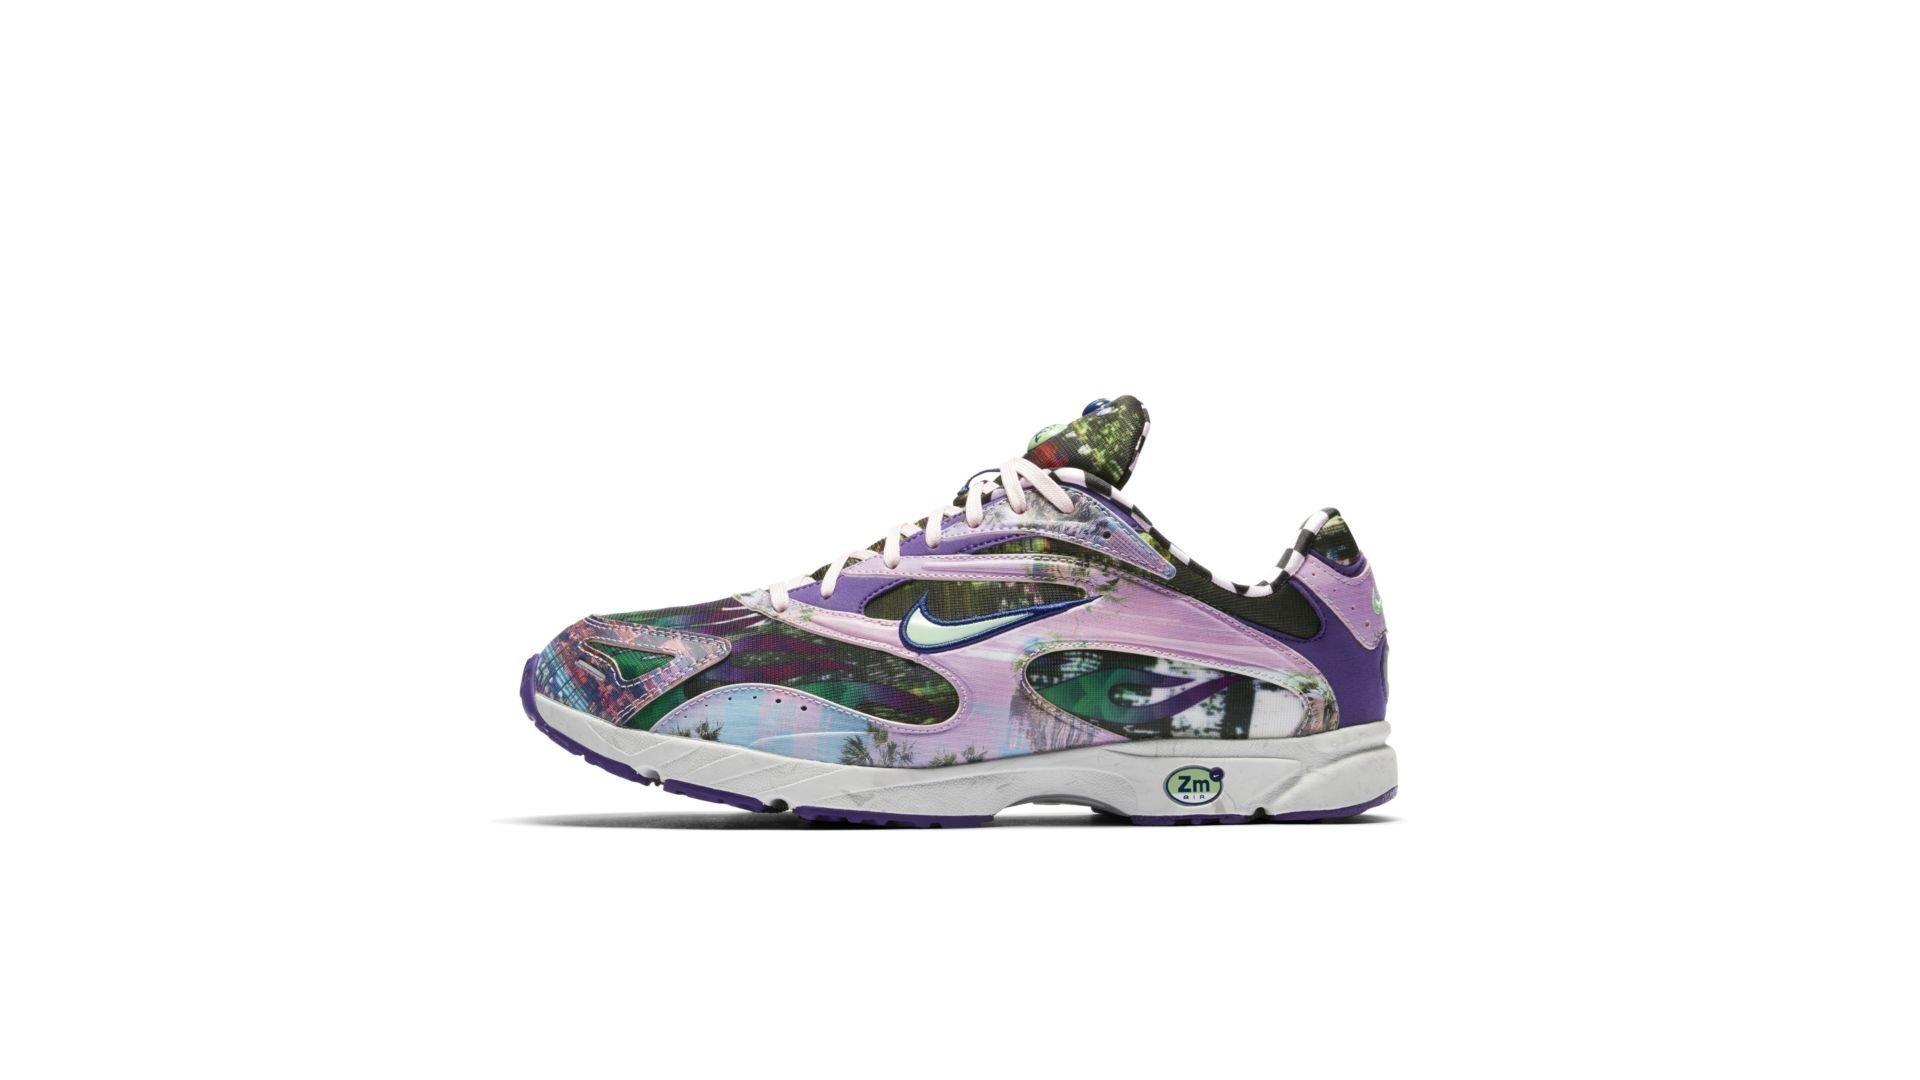 Nike Zoom Streak Spectrum Plus Court Purple (AR1533-500)